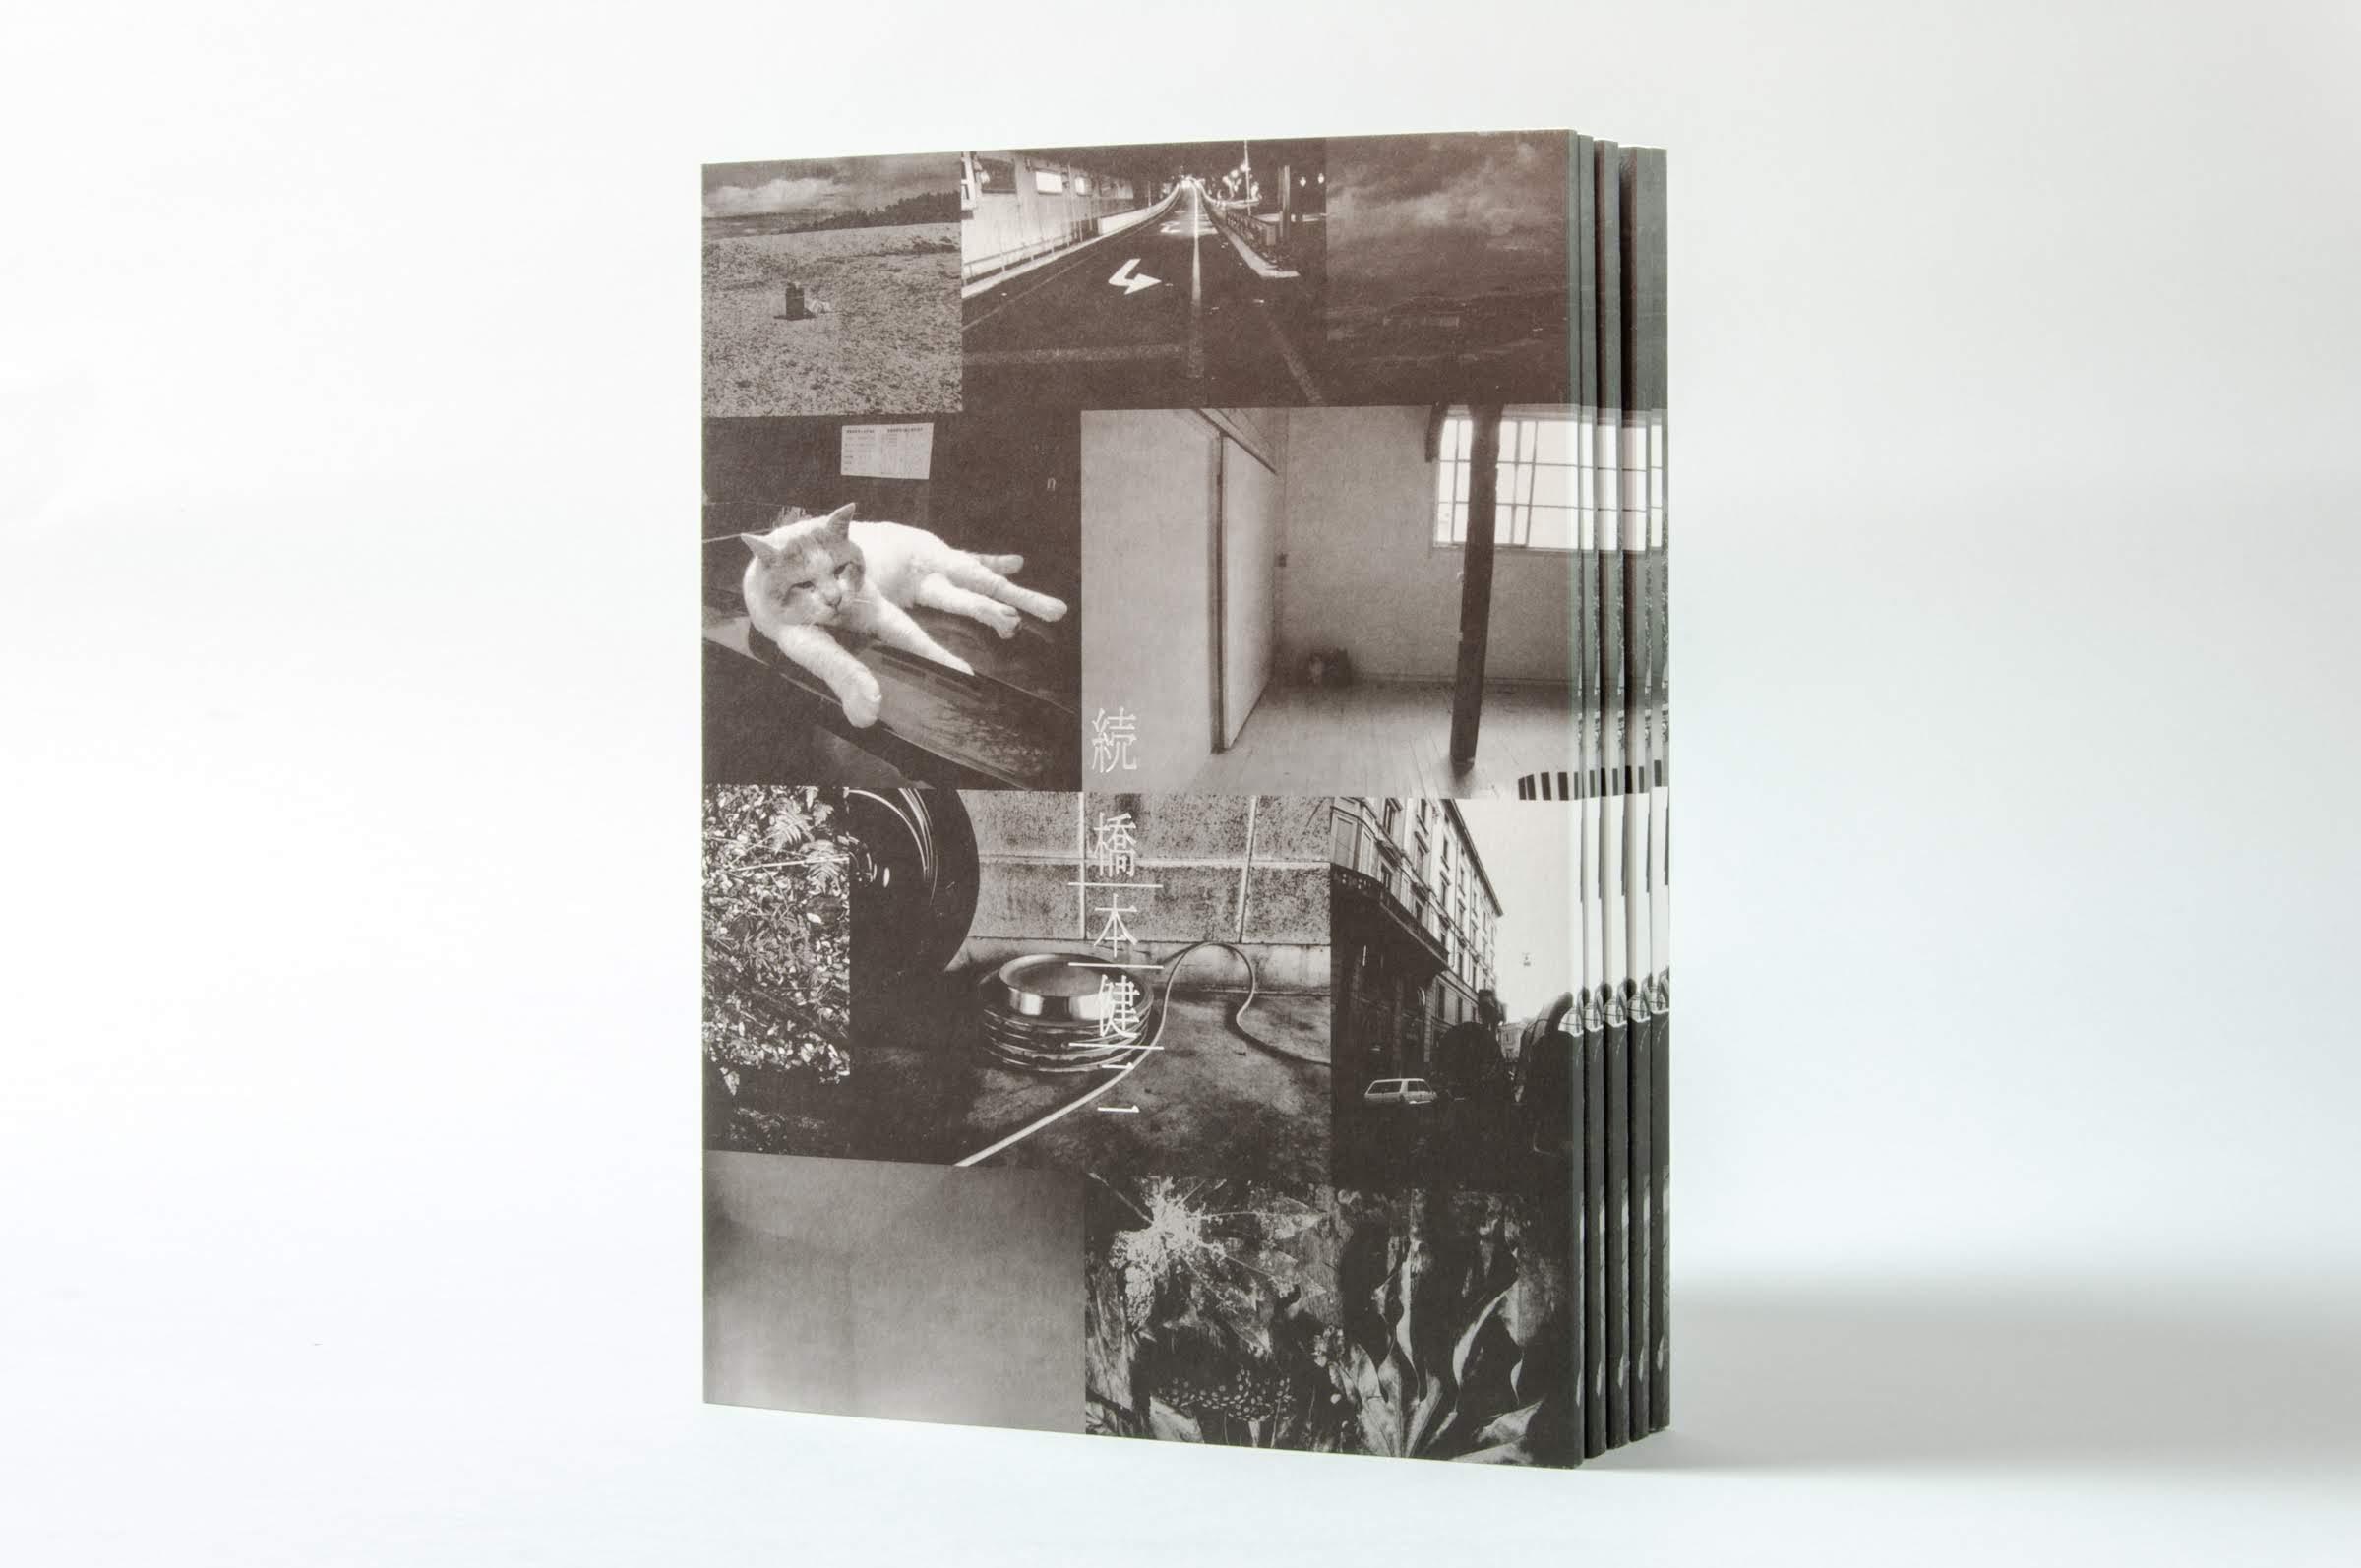 used living 連載企画小説「続 橋本健二」|Book Design by MONARCH